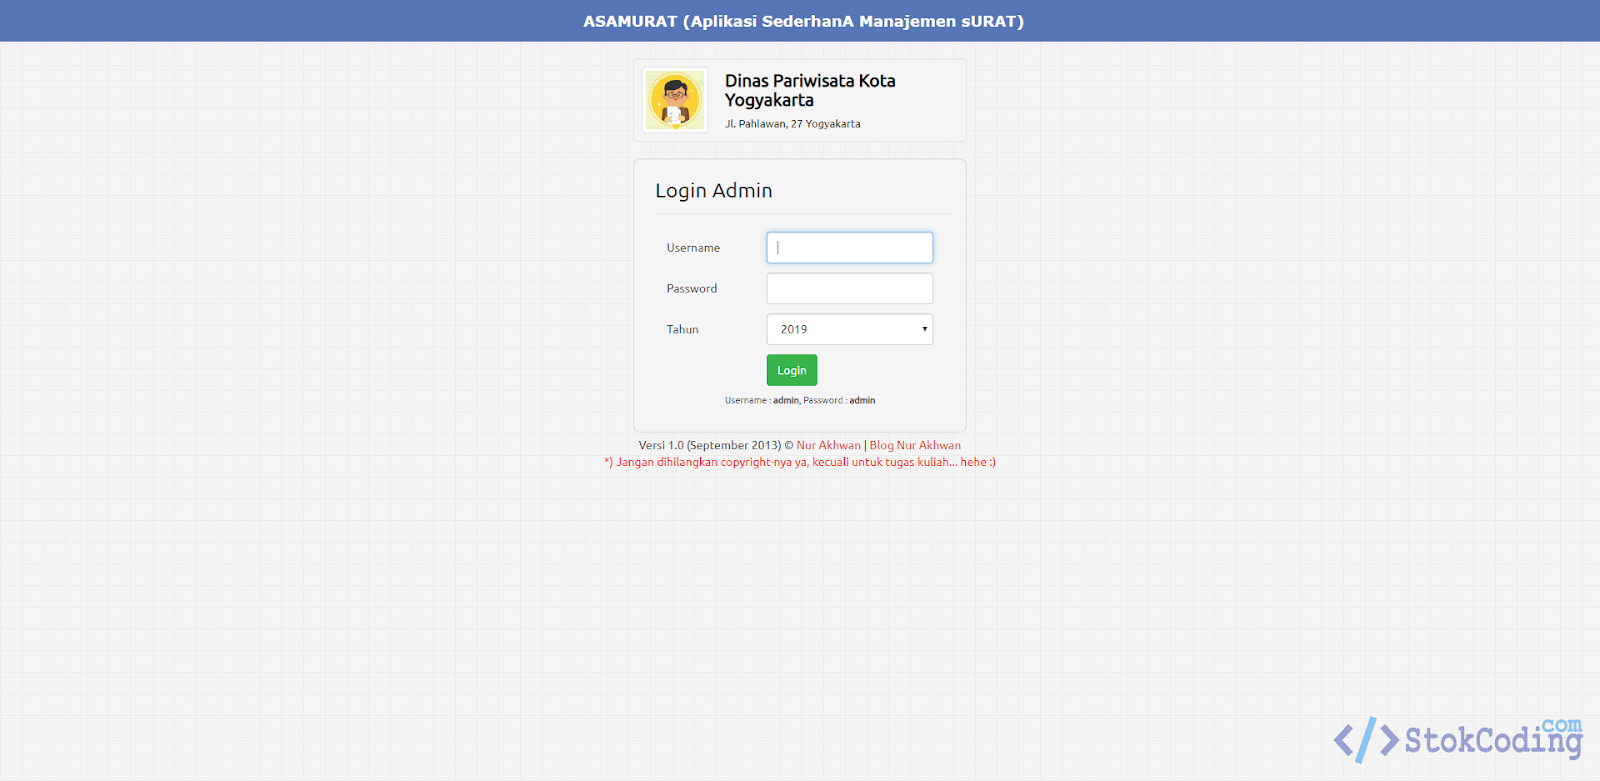 Sistem Aplikasi Managemen Surat (Codeigniter)